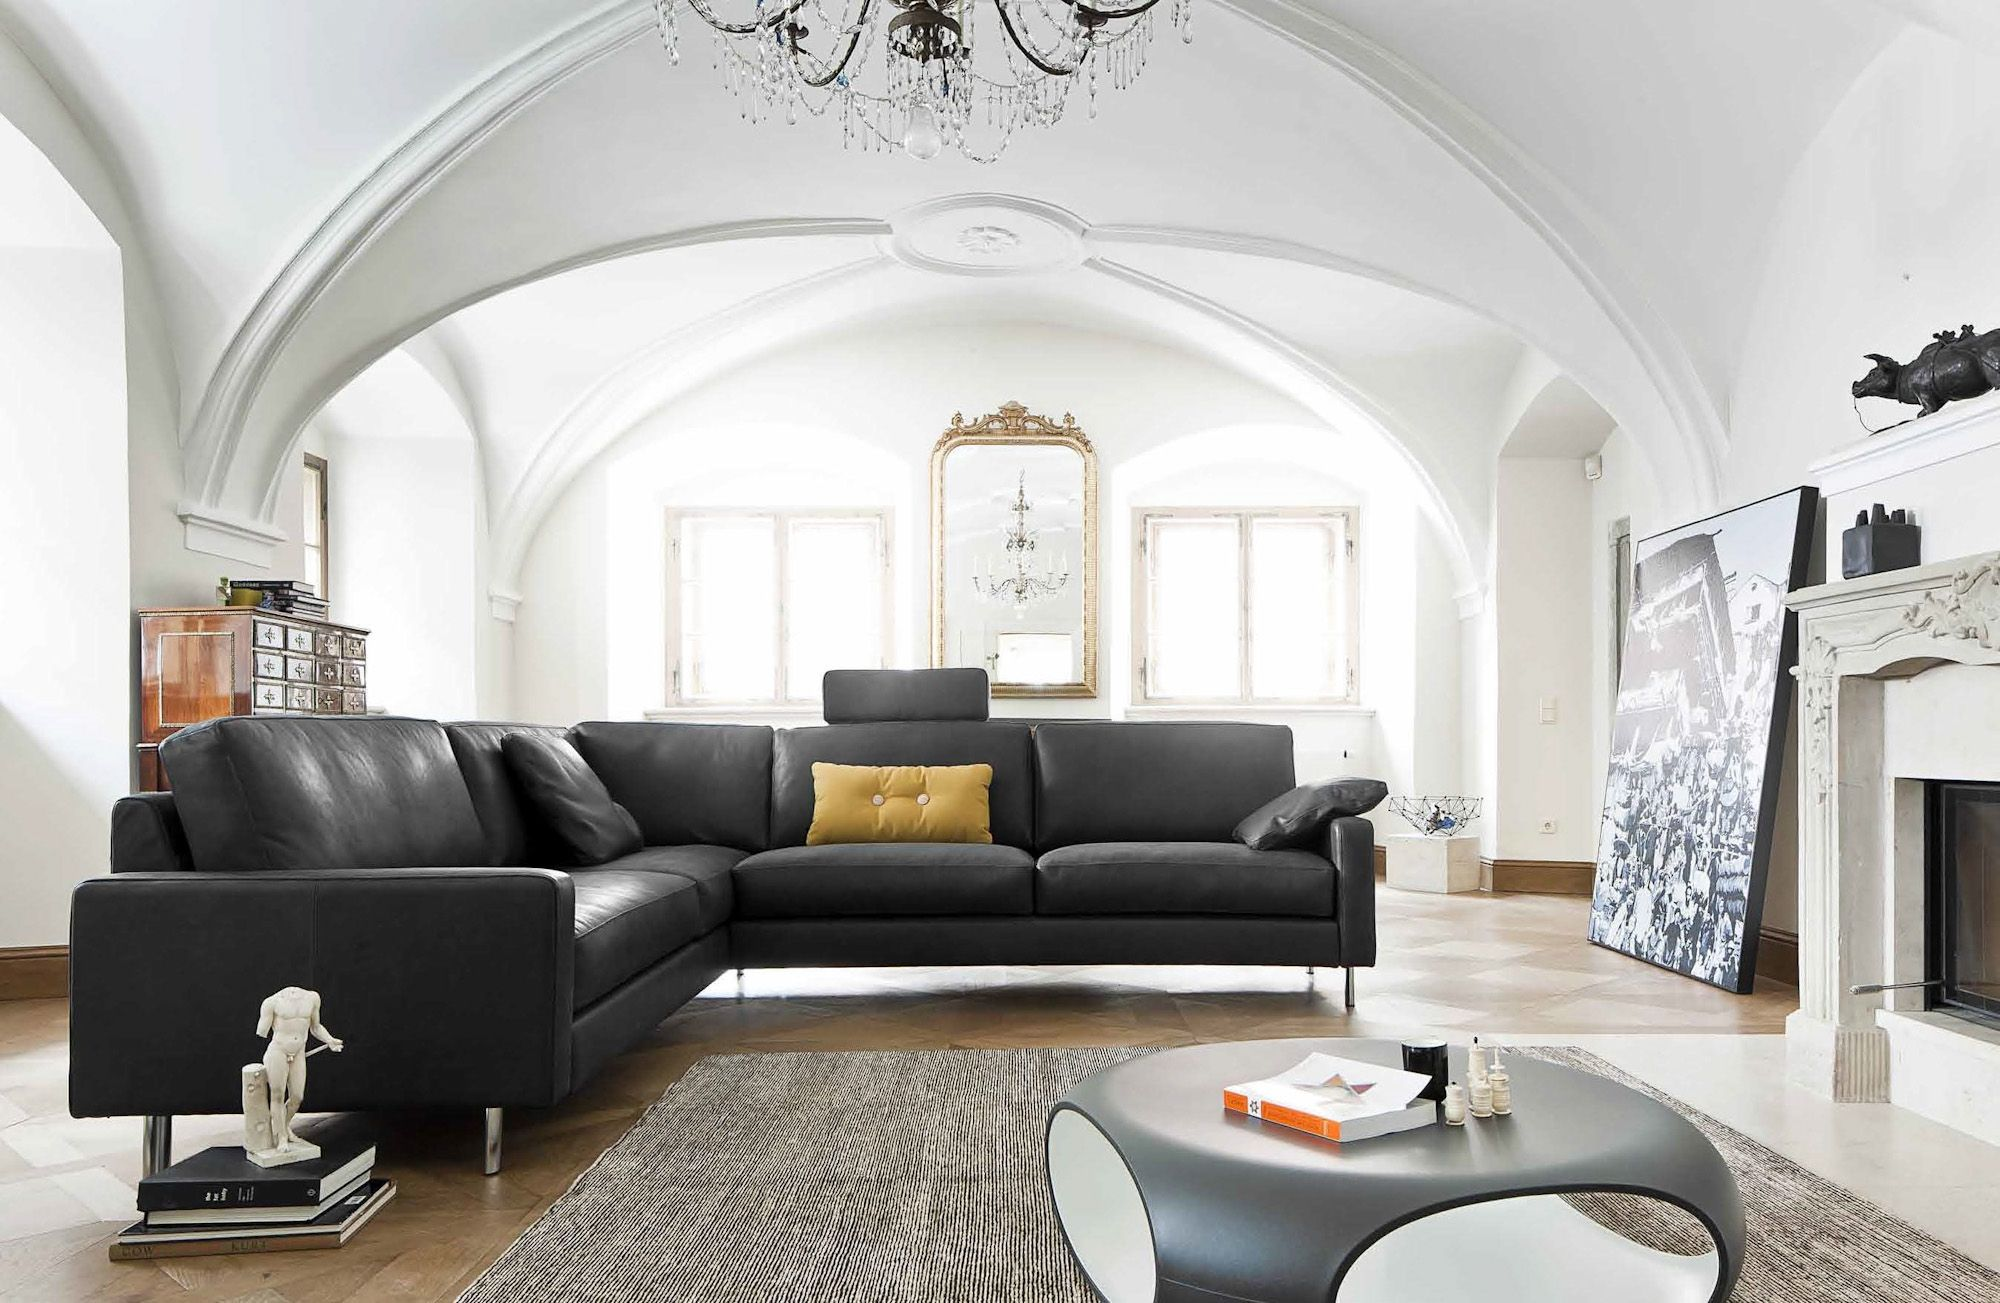 modernes Sofa | Ecksofa | Leder | schwarz - bei Möbel ...